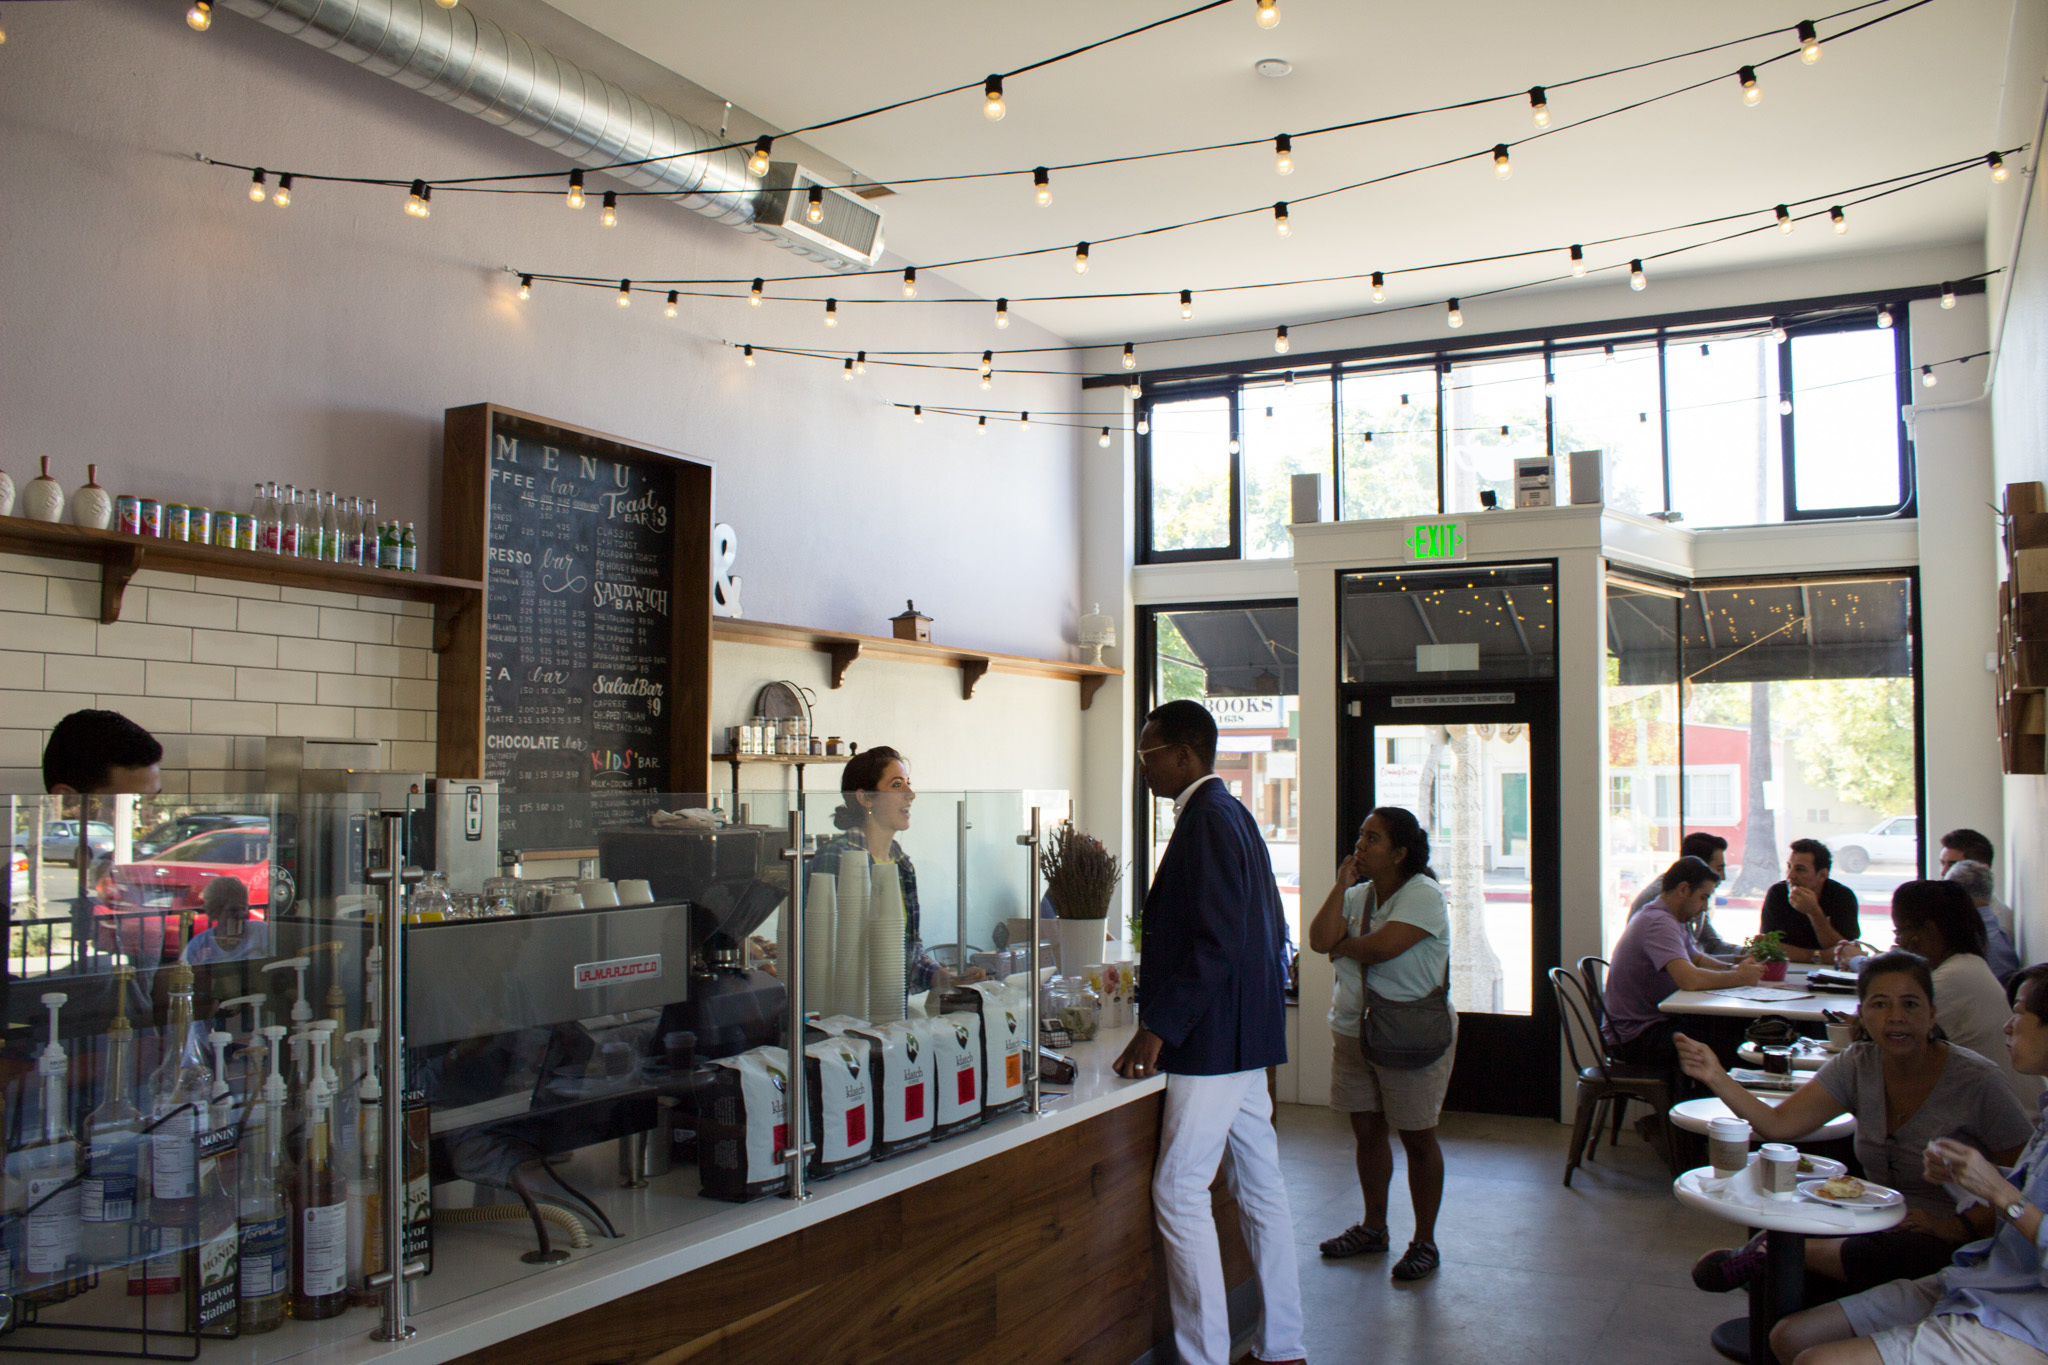 The best coffee shops in Pasadena